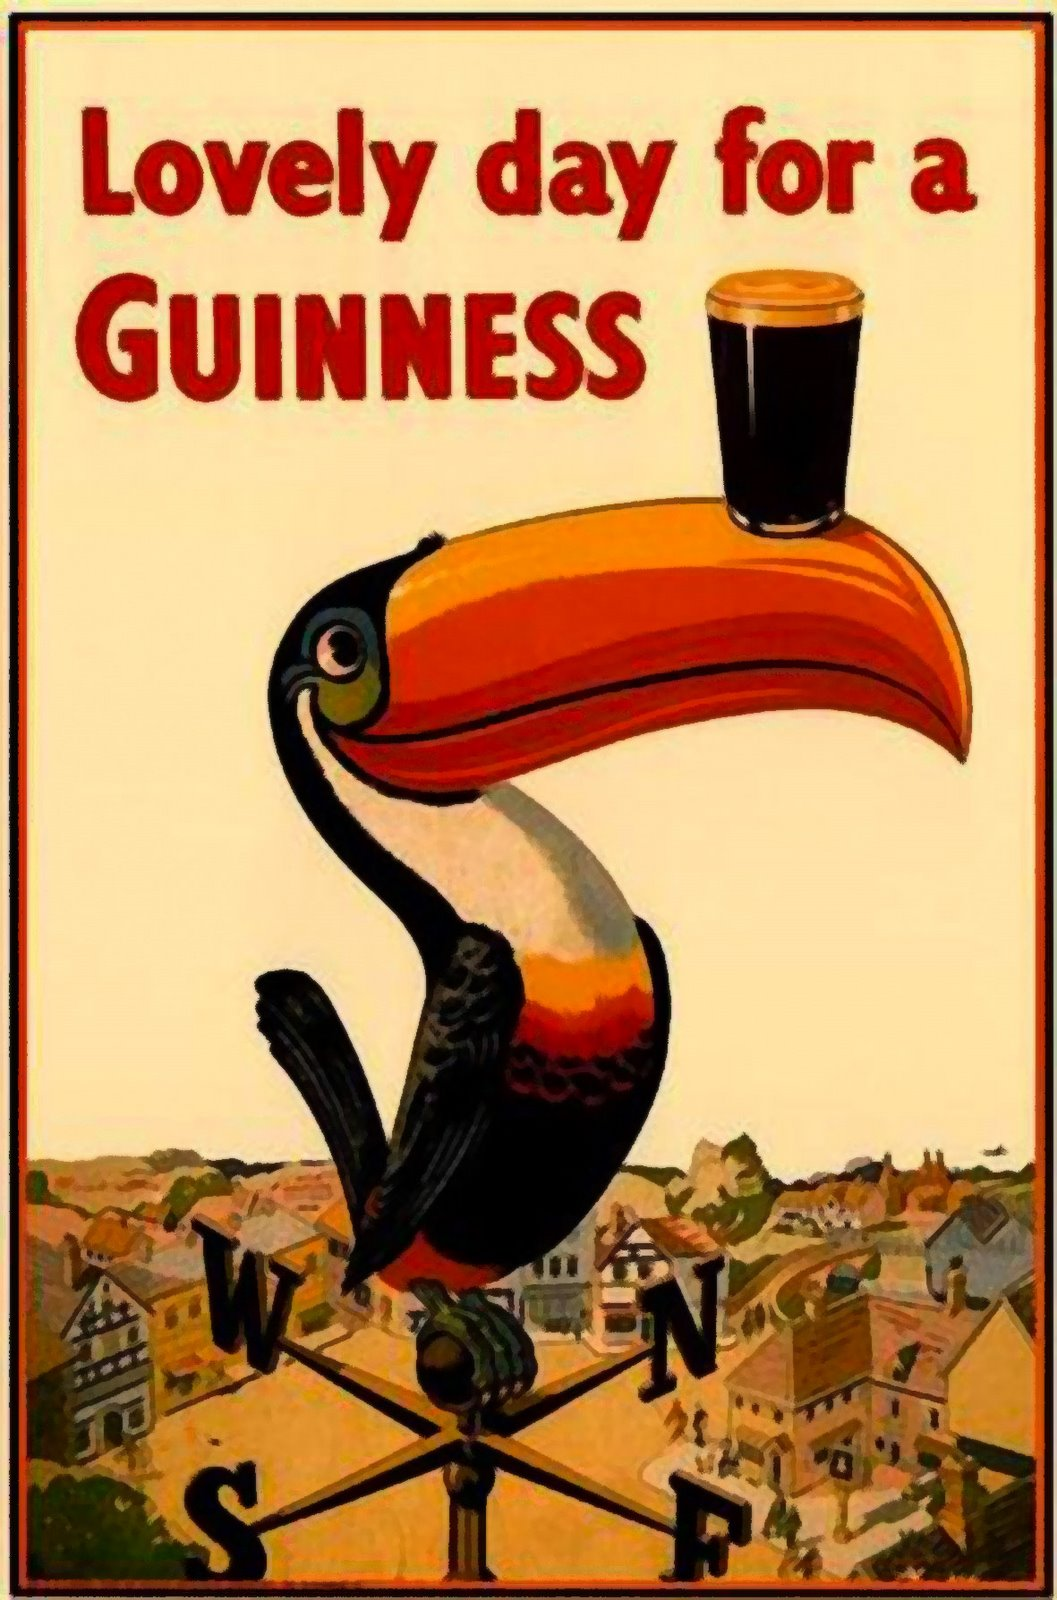 Irish clipart guinness Art Vintage+Art+Posters Guiness Stout